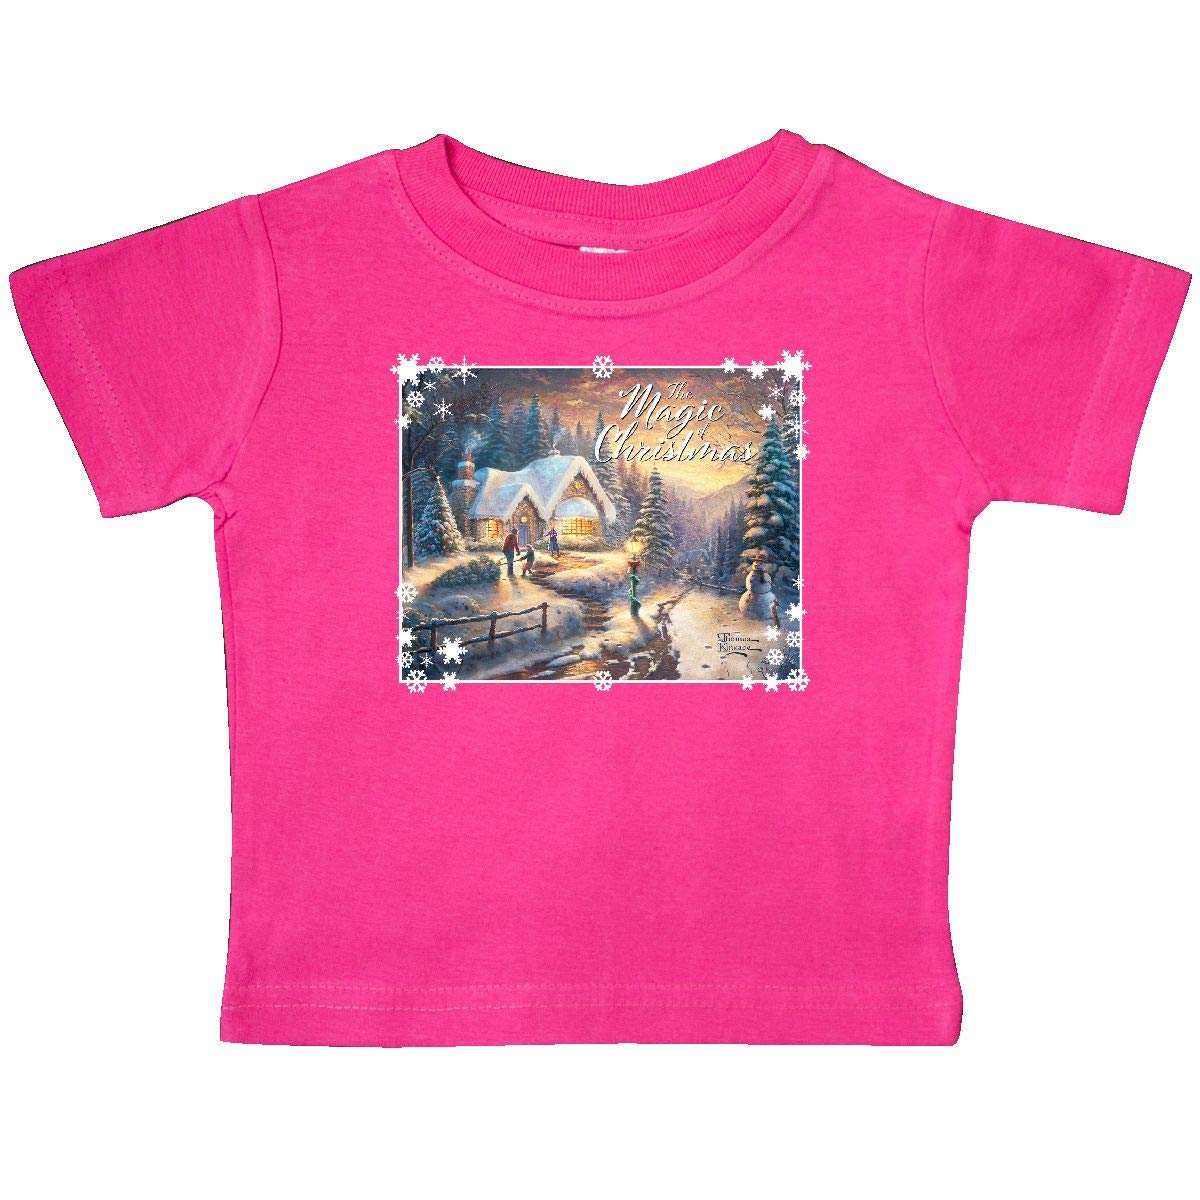 inktastic Country Christmas Homecoming Baby T-Shirt Thomas Kinkade